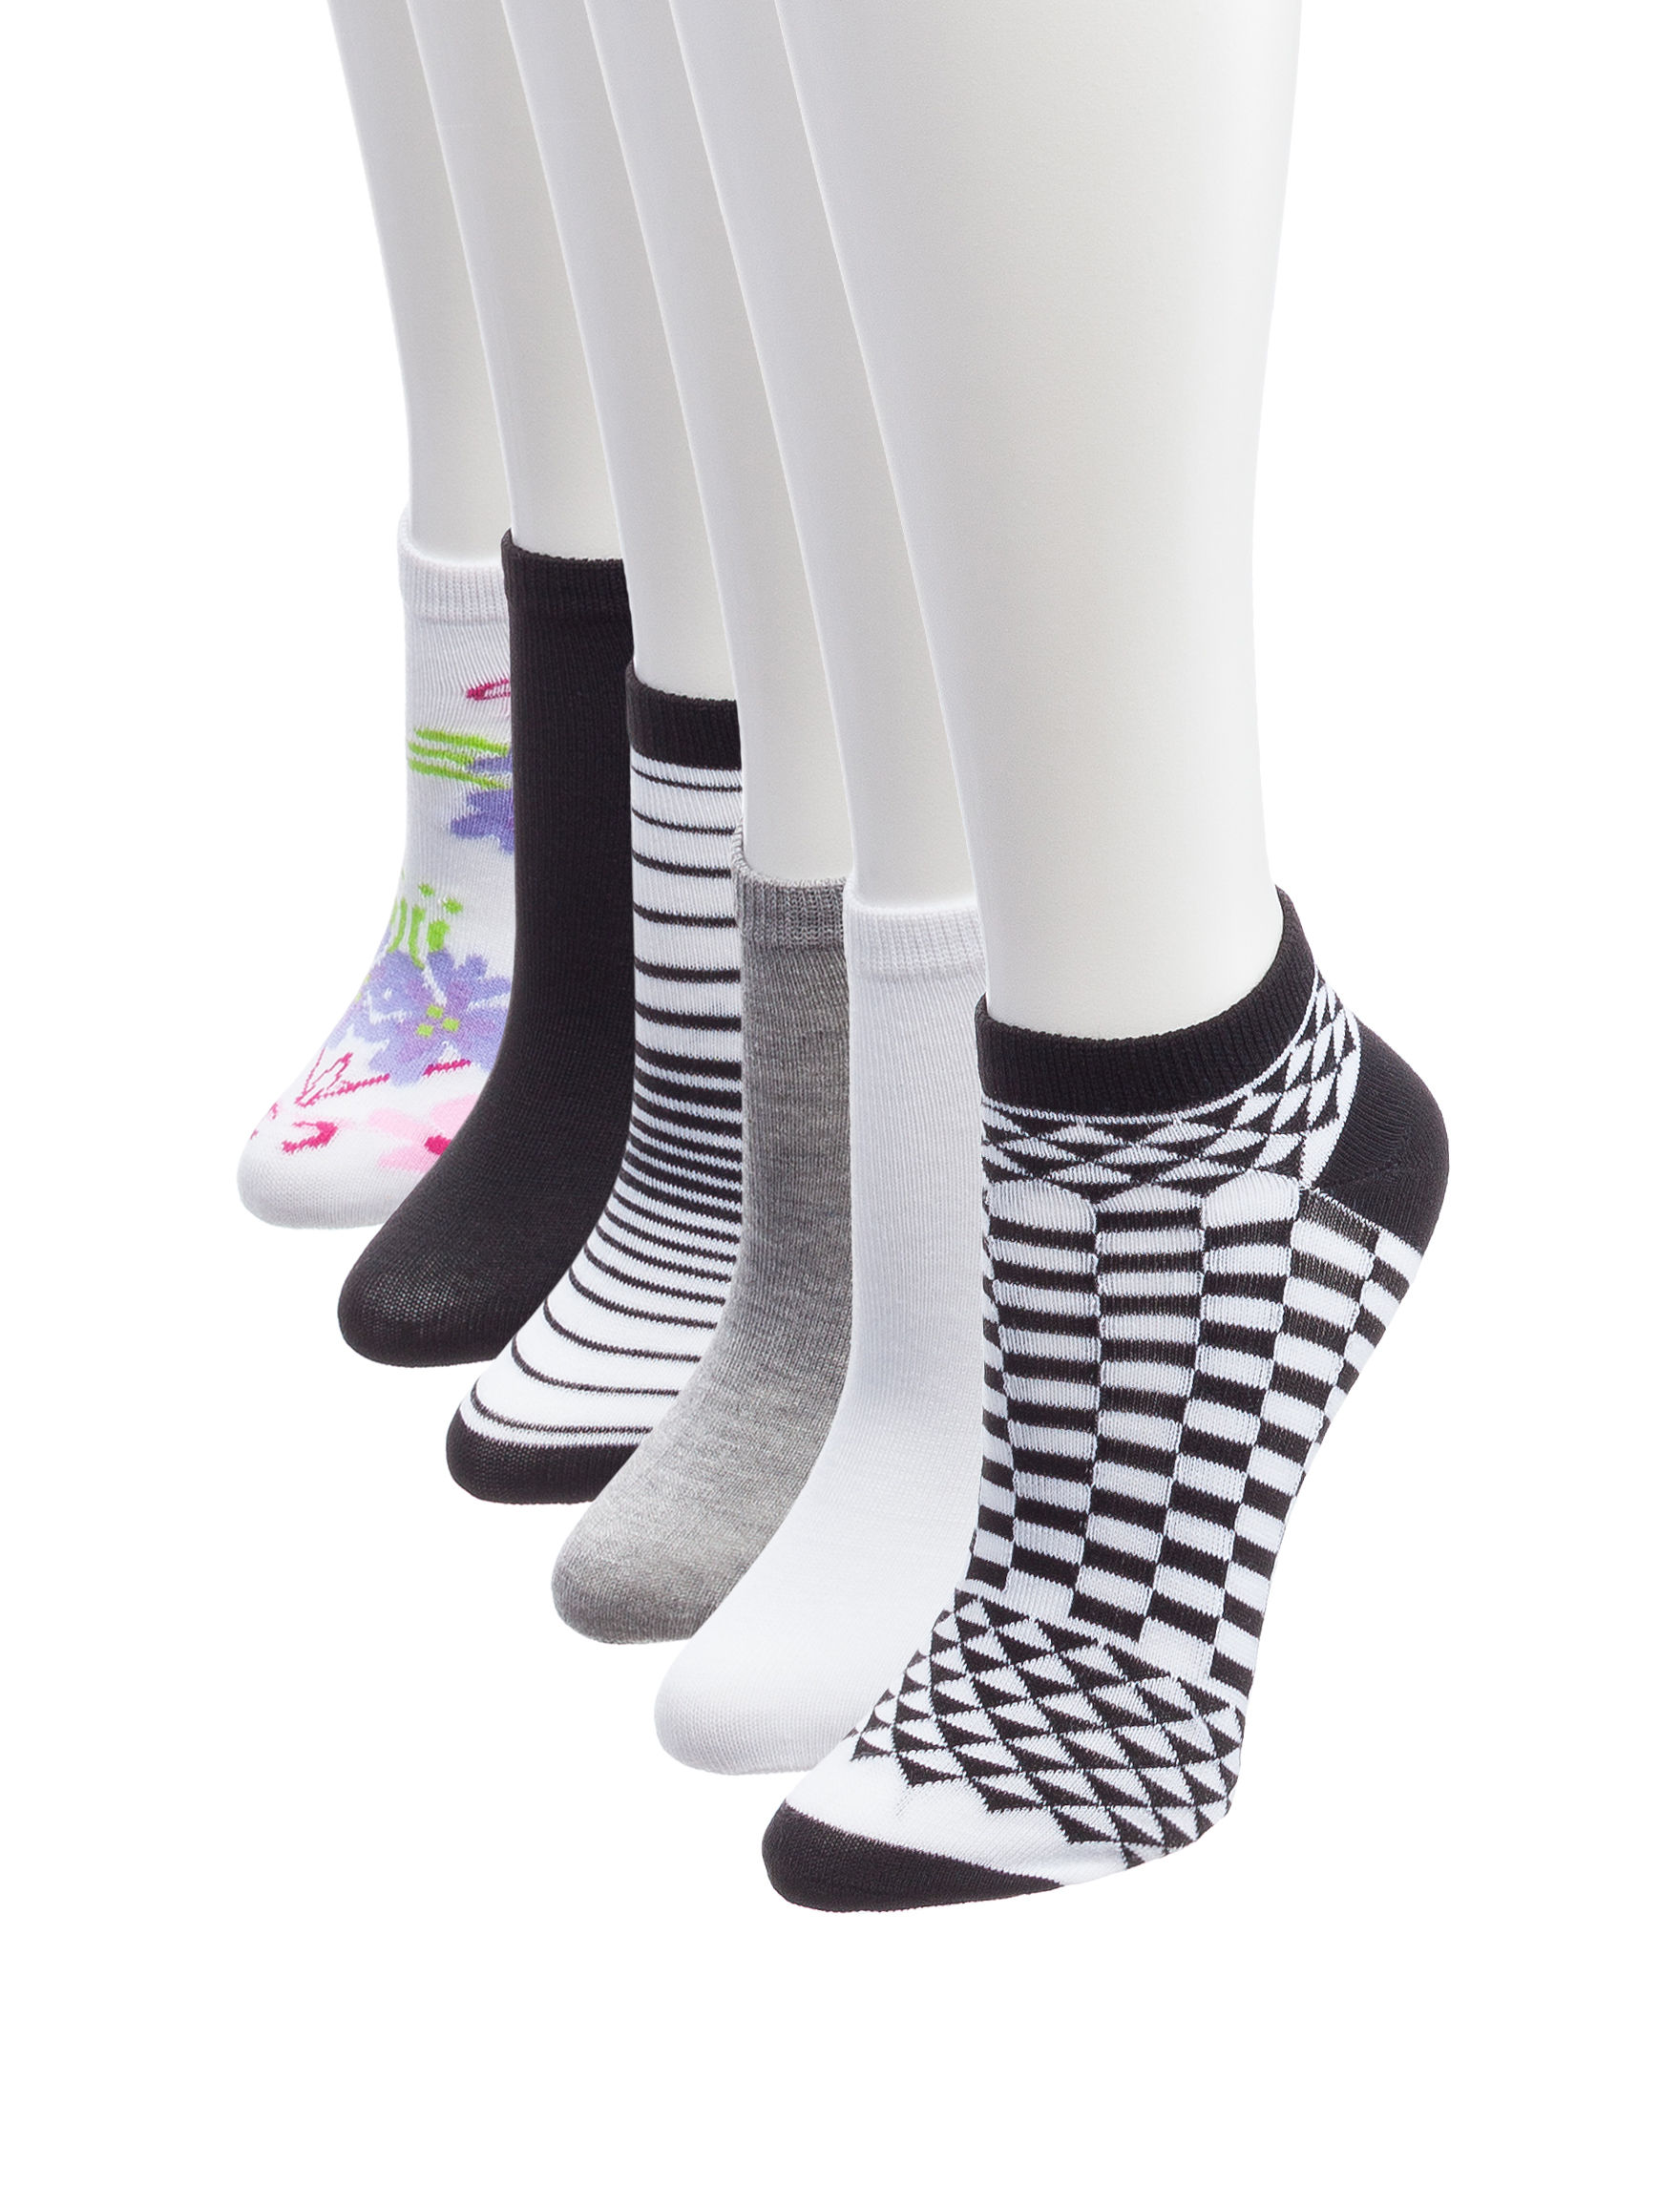 Signature Studio Multi Socks